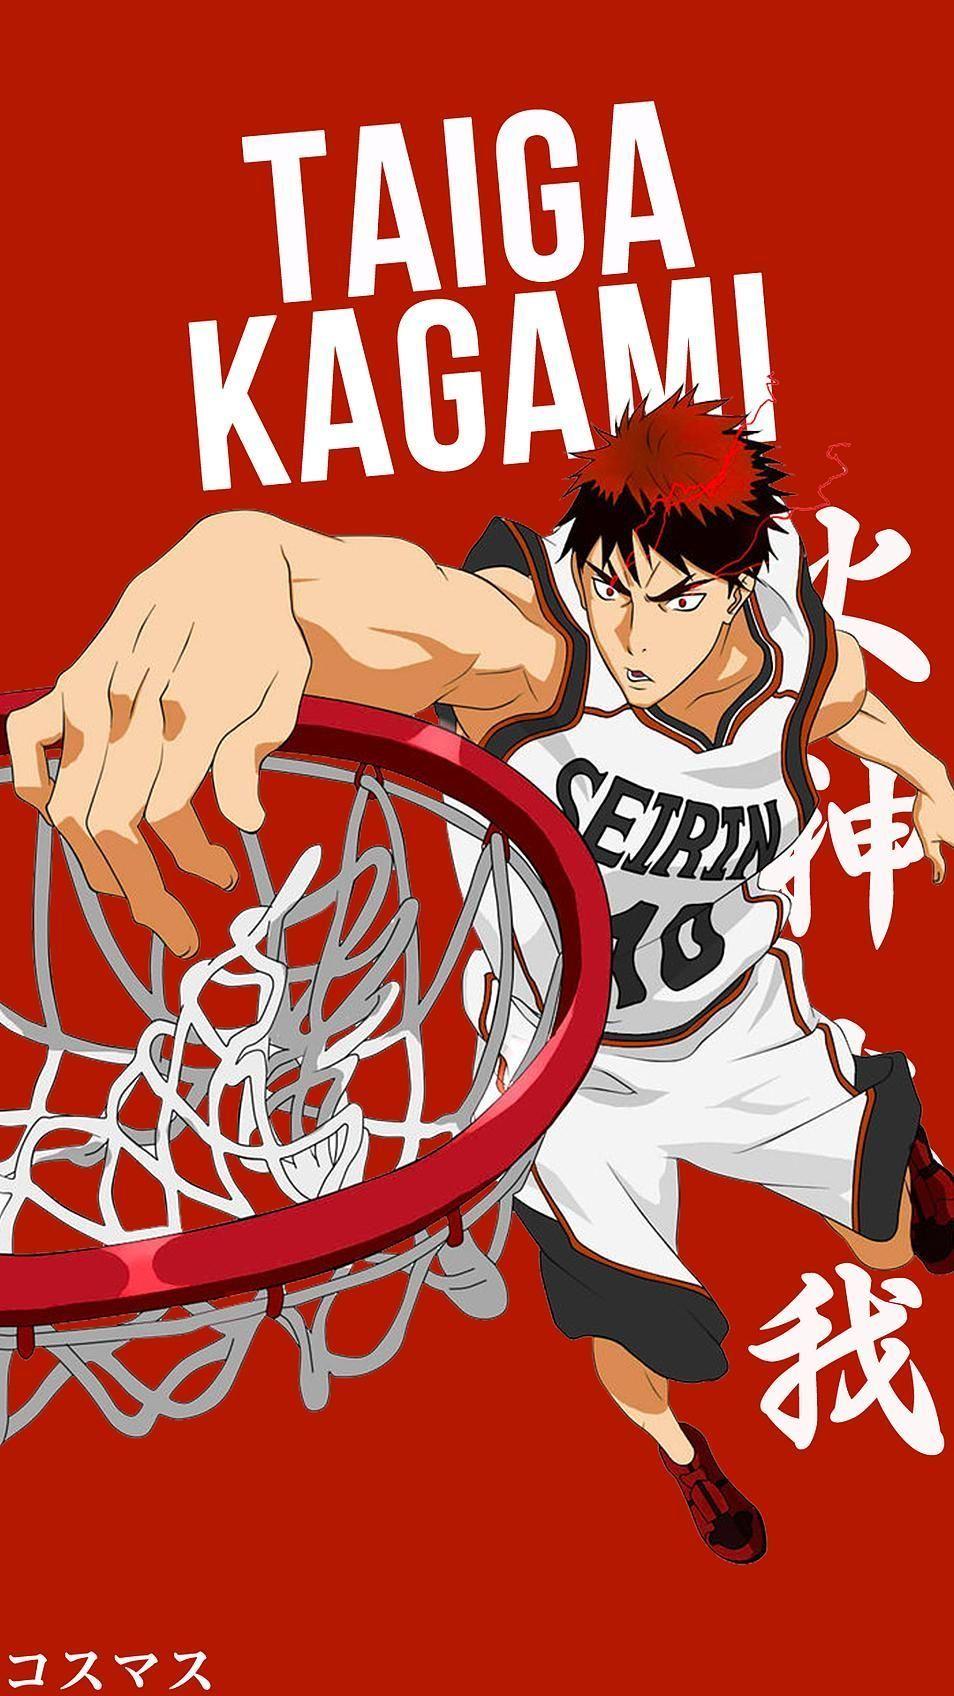 Kagami Taiga Korigengi Wallpaper Anime